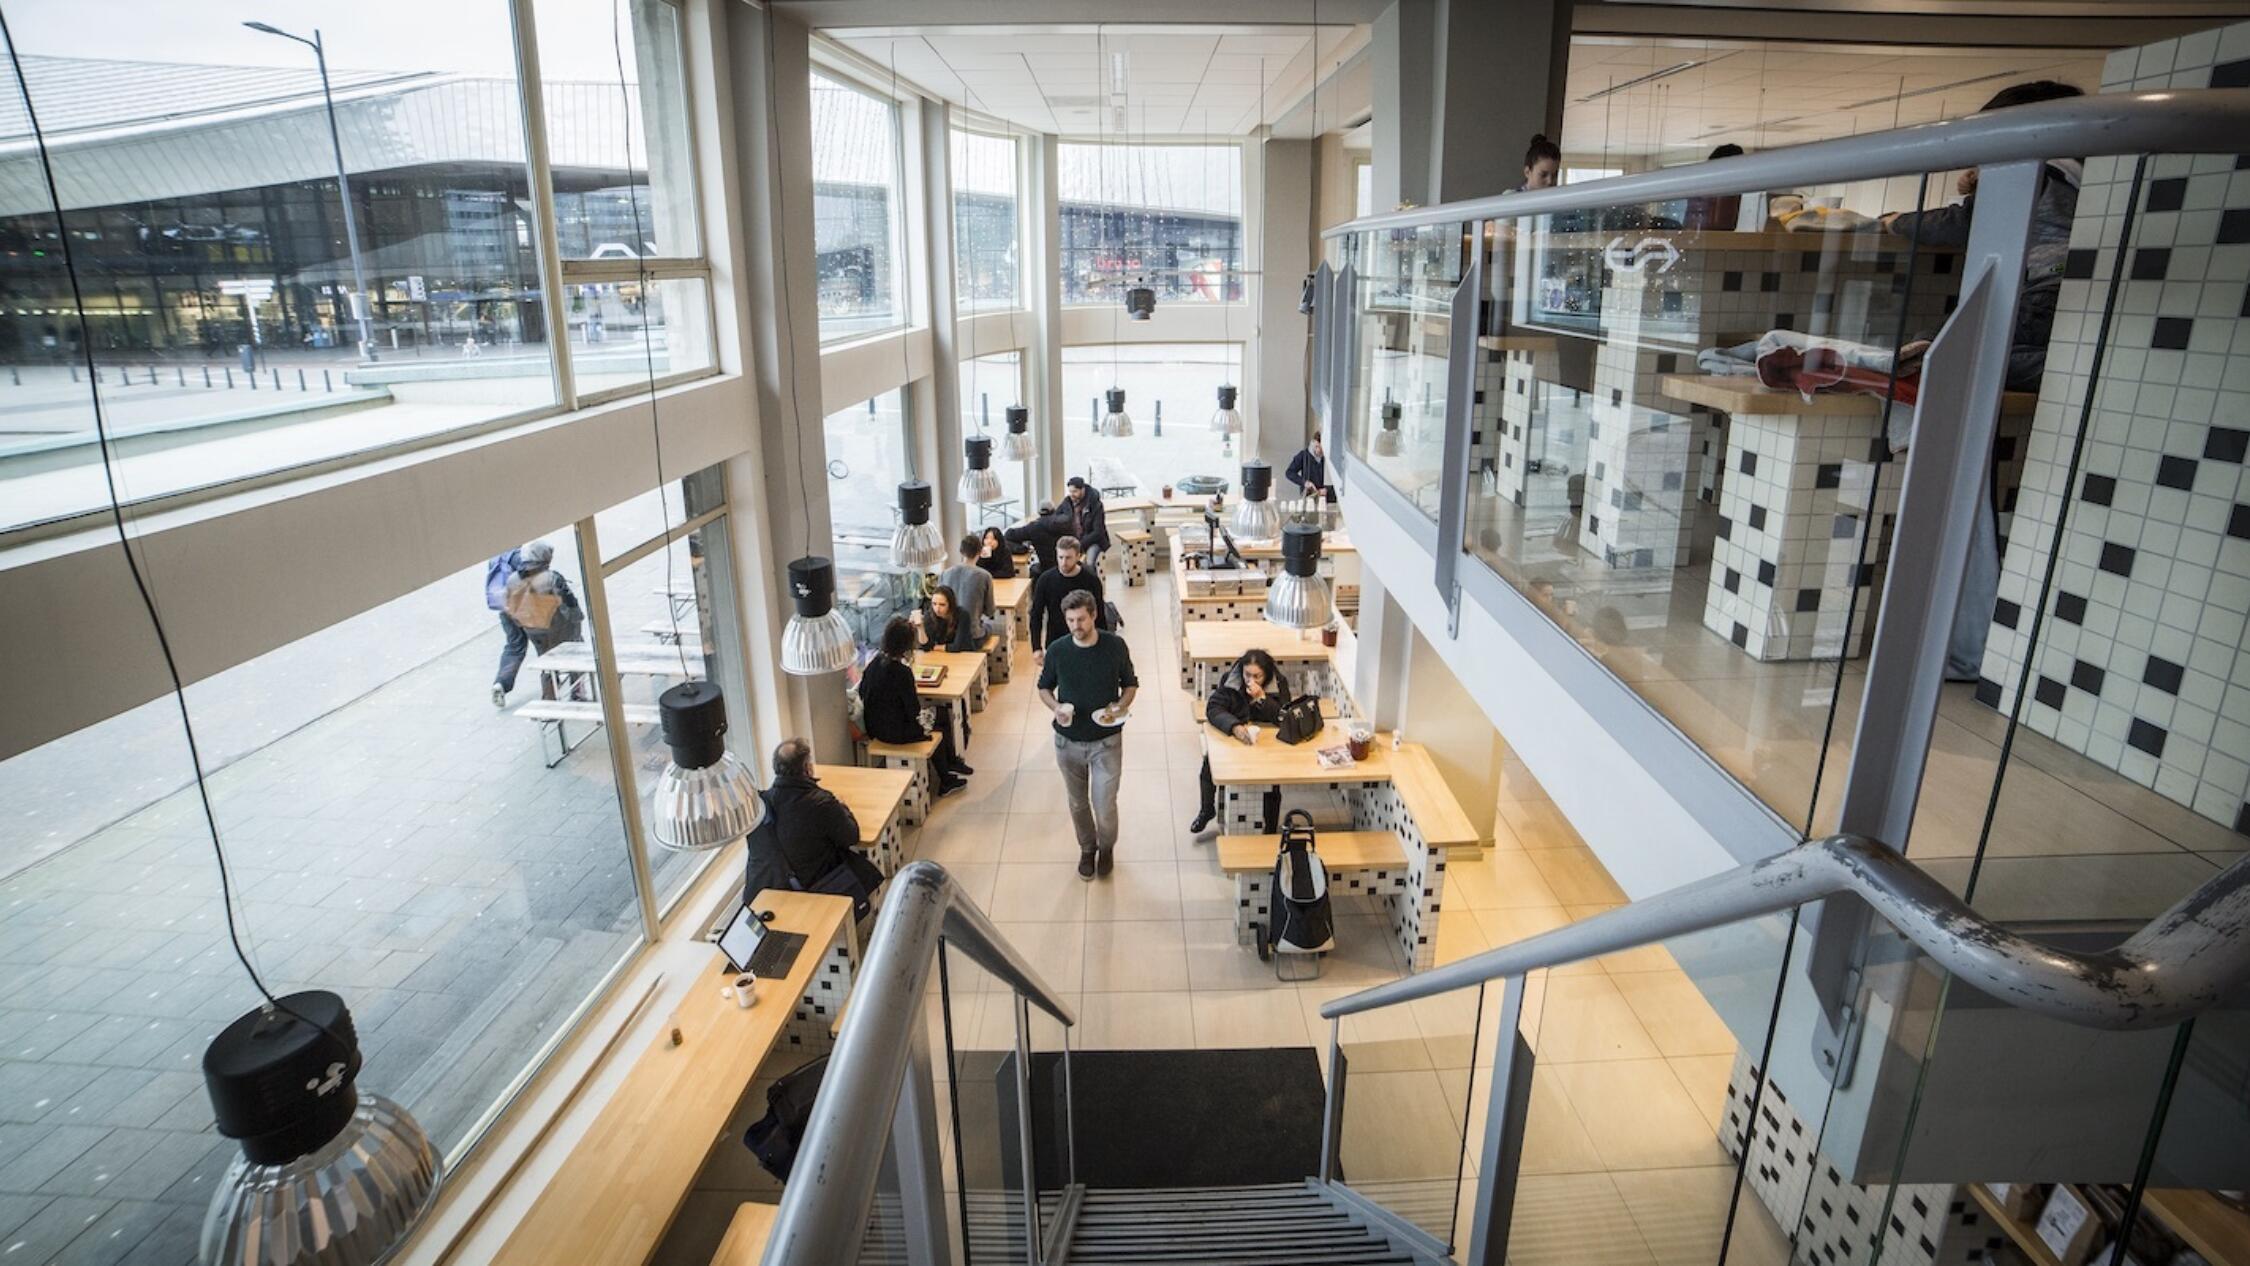 Groot Handelsgebouw interior common area with people working at tables